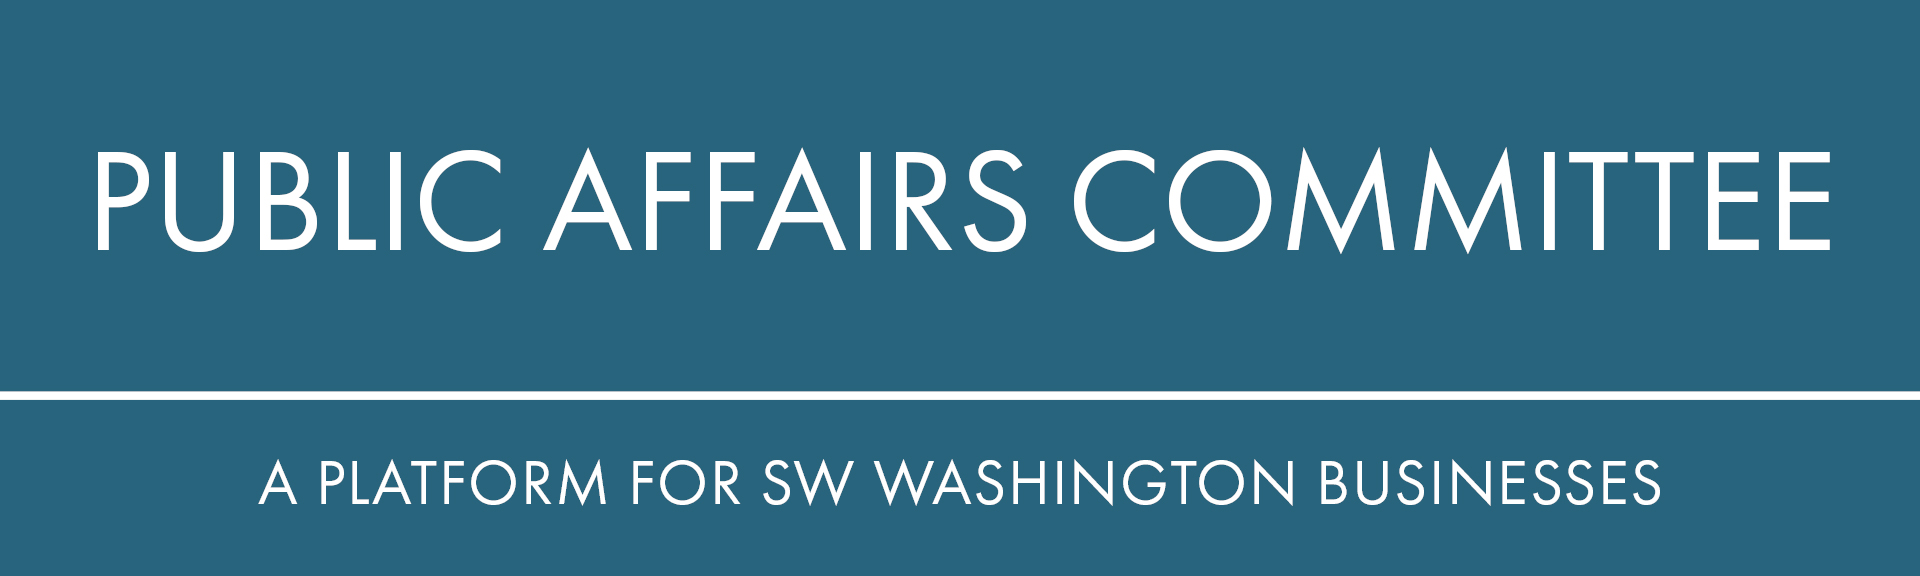 Public affairs committee platform for sw washington businesses business community small large economic development